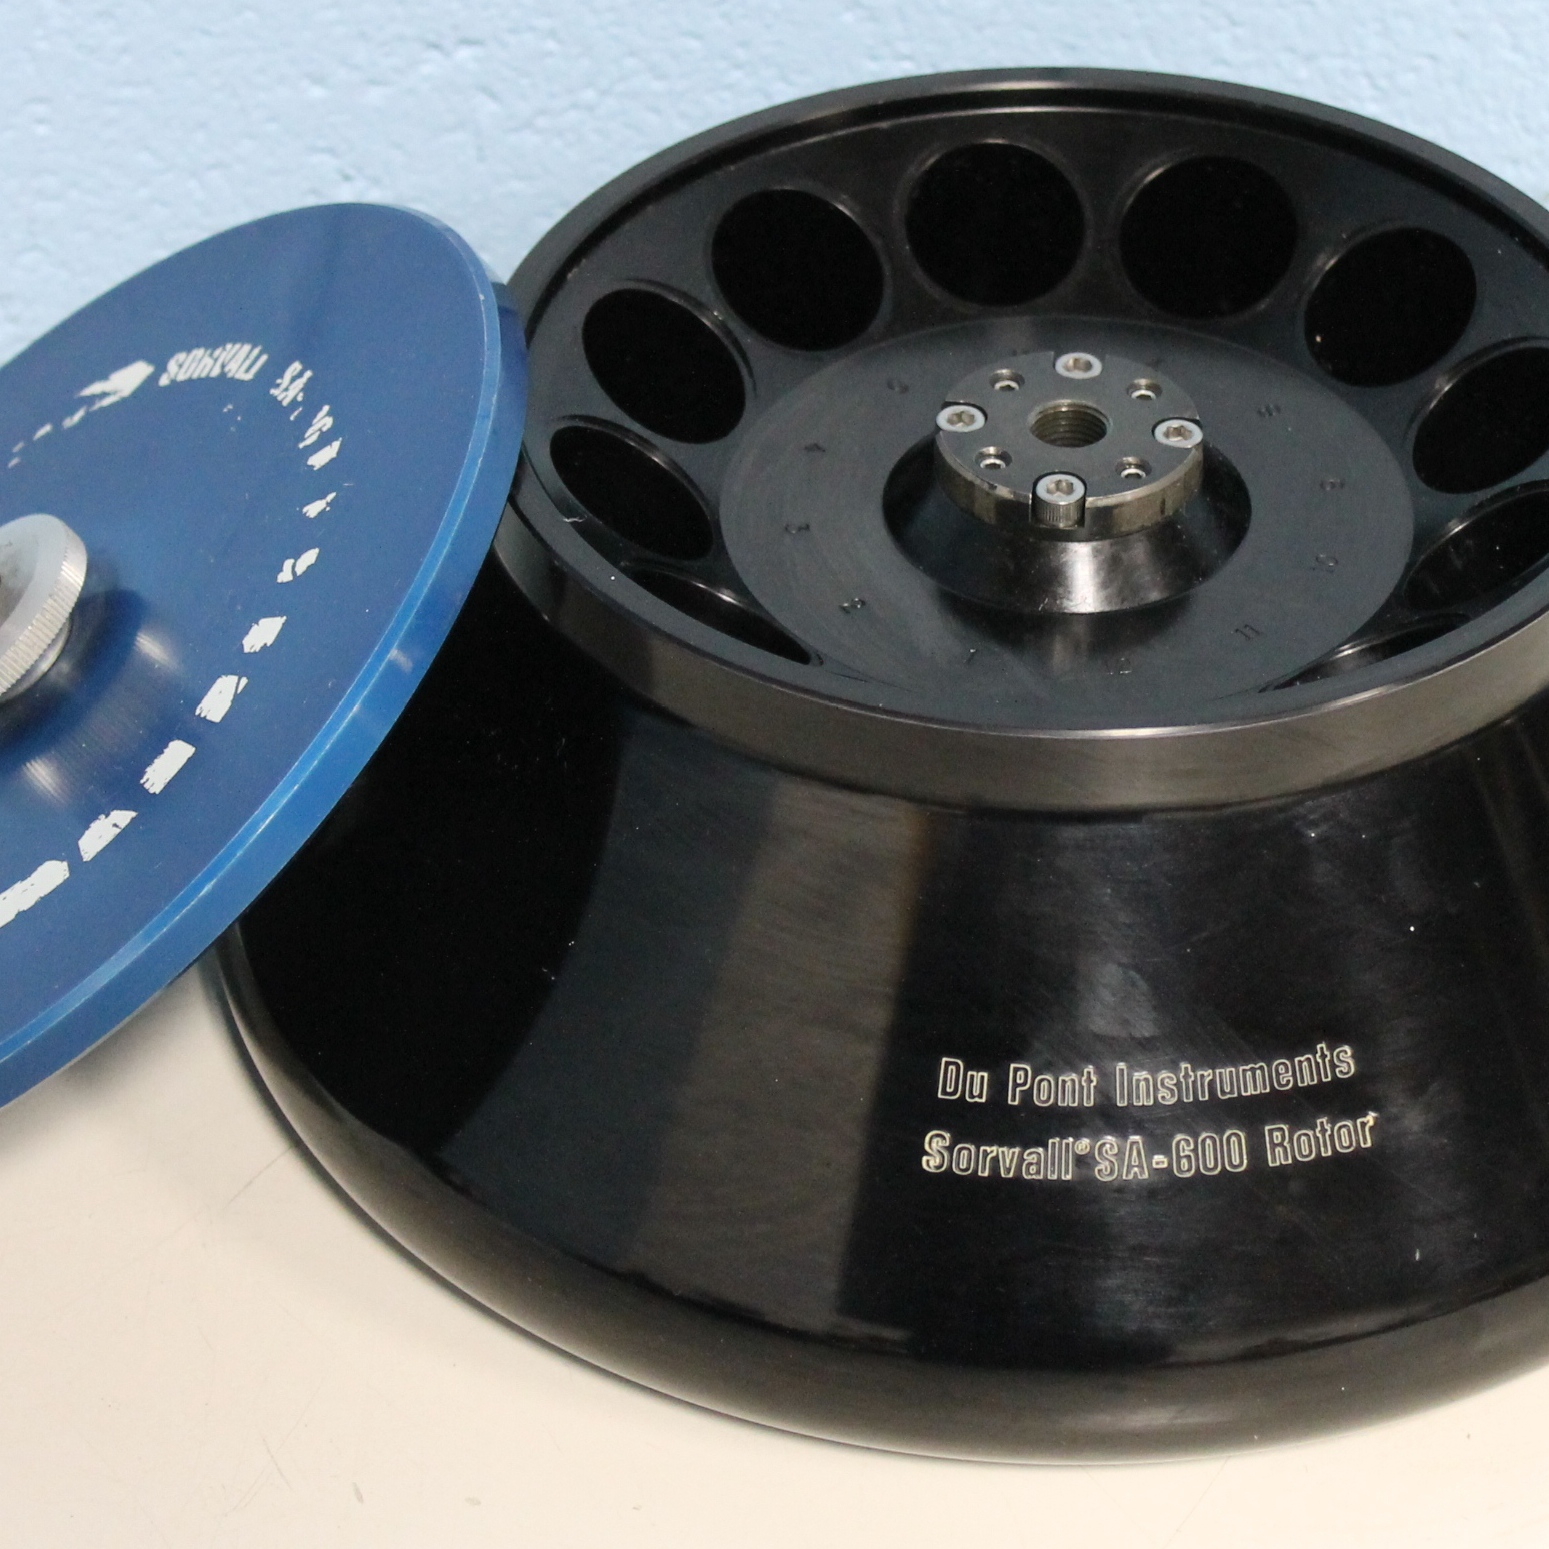 Sorvall SA-600 Rotor Image